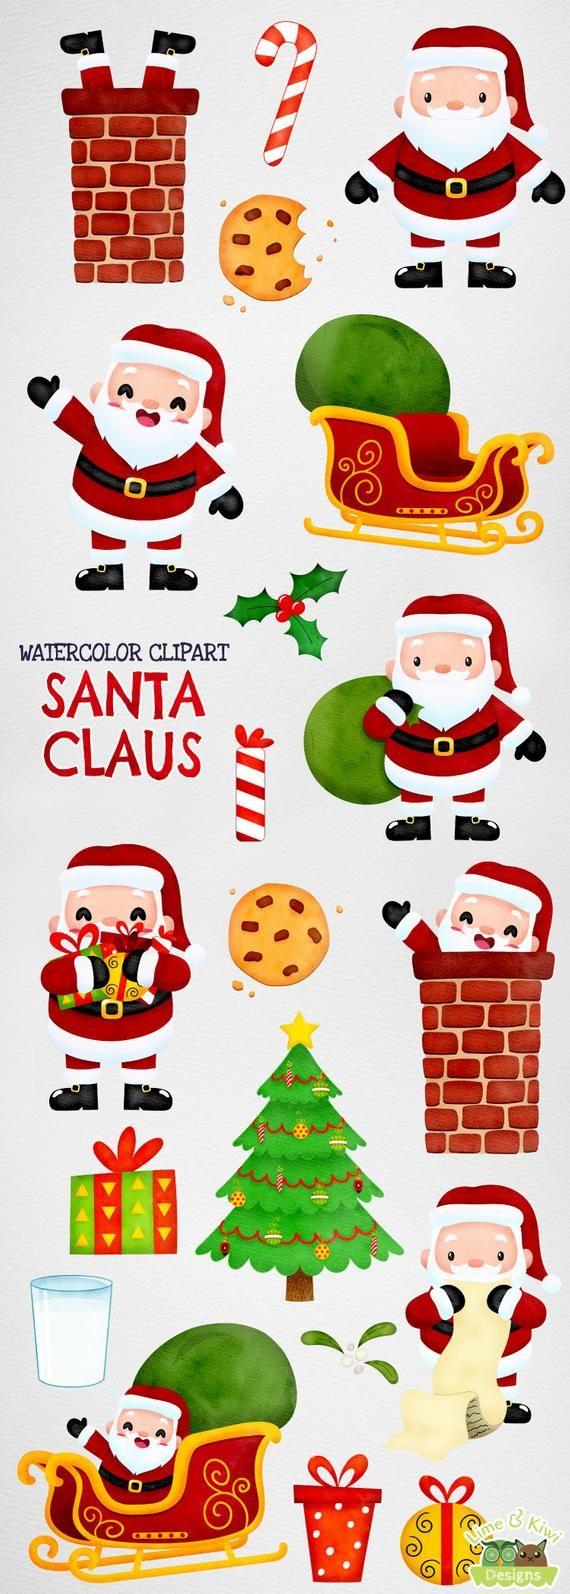 medium resolution of santa claus watercolor clipart instant download vector art etsy